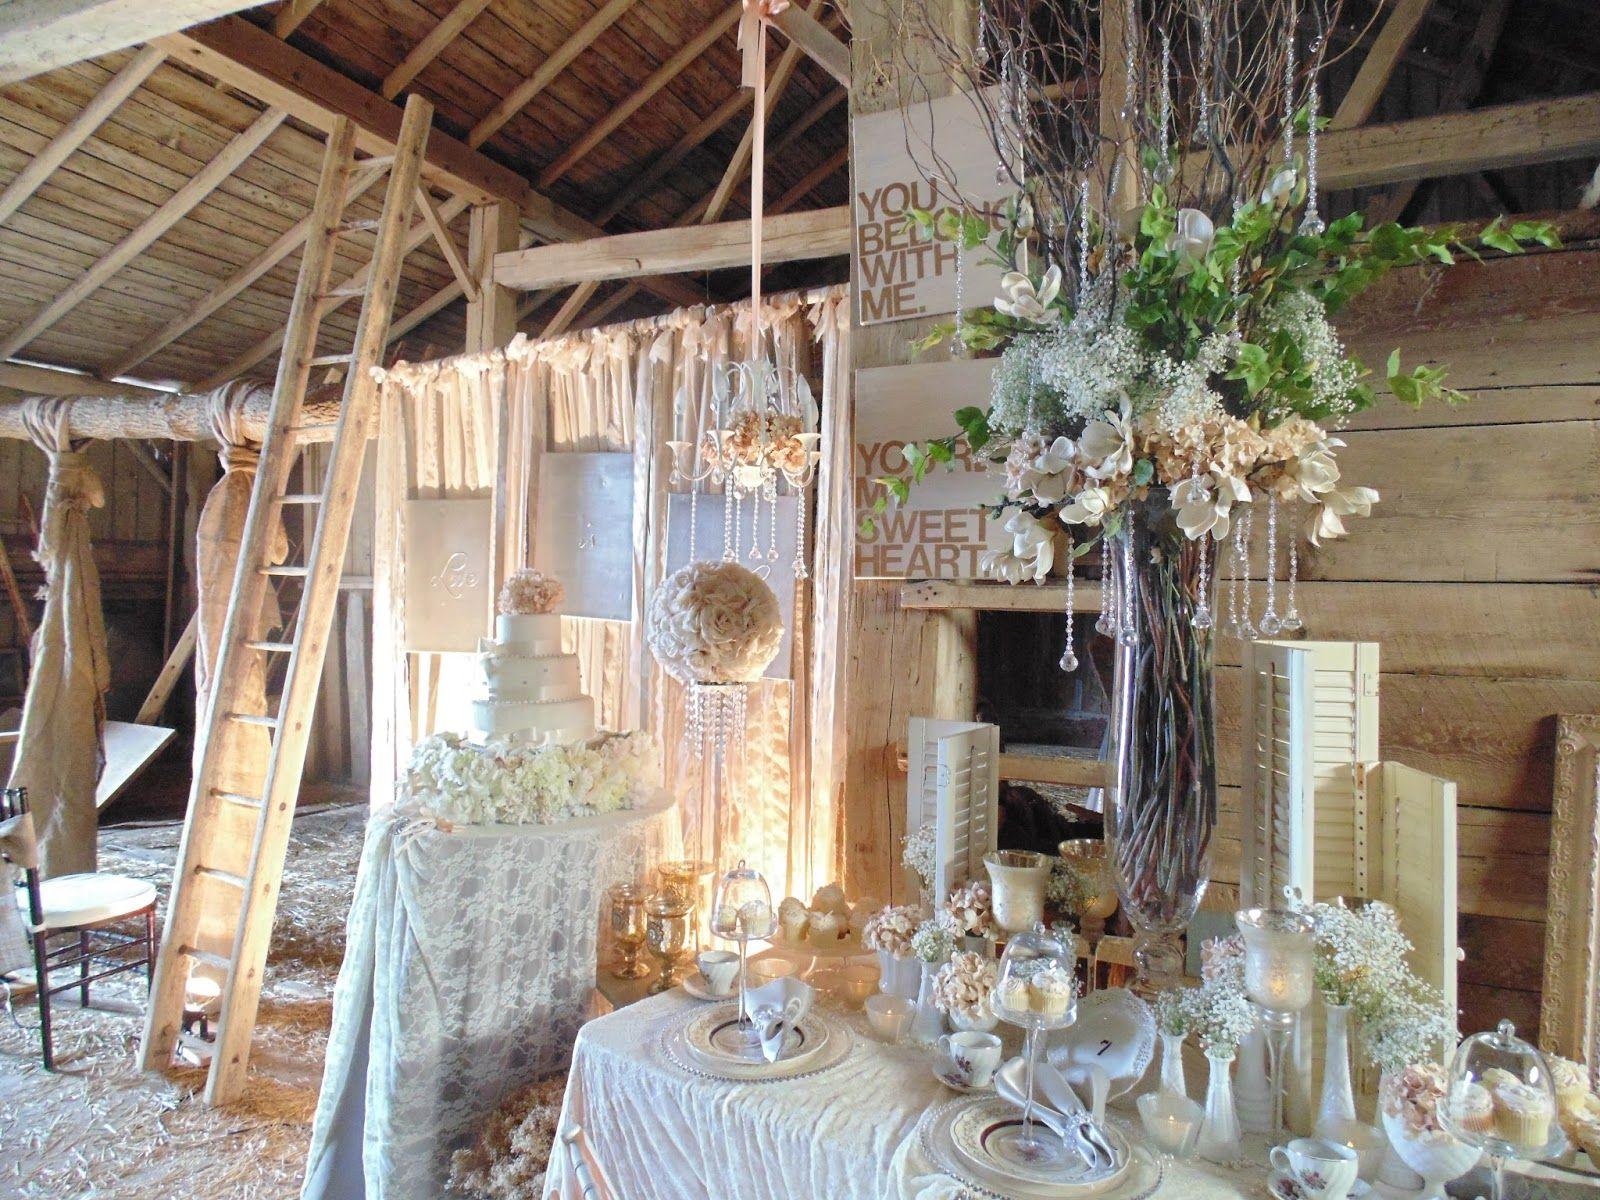 Uncategorized/outdoor vintage glam wedding rustic wedding chic - Uncategorized/outdoor Vintage Glam Wedding Rustic Wedding Chic 14